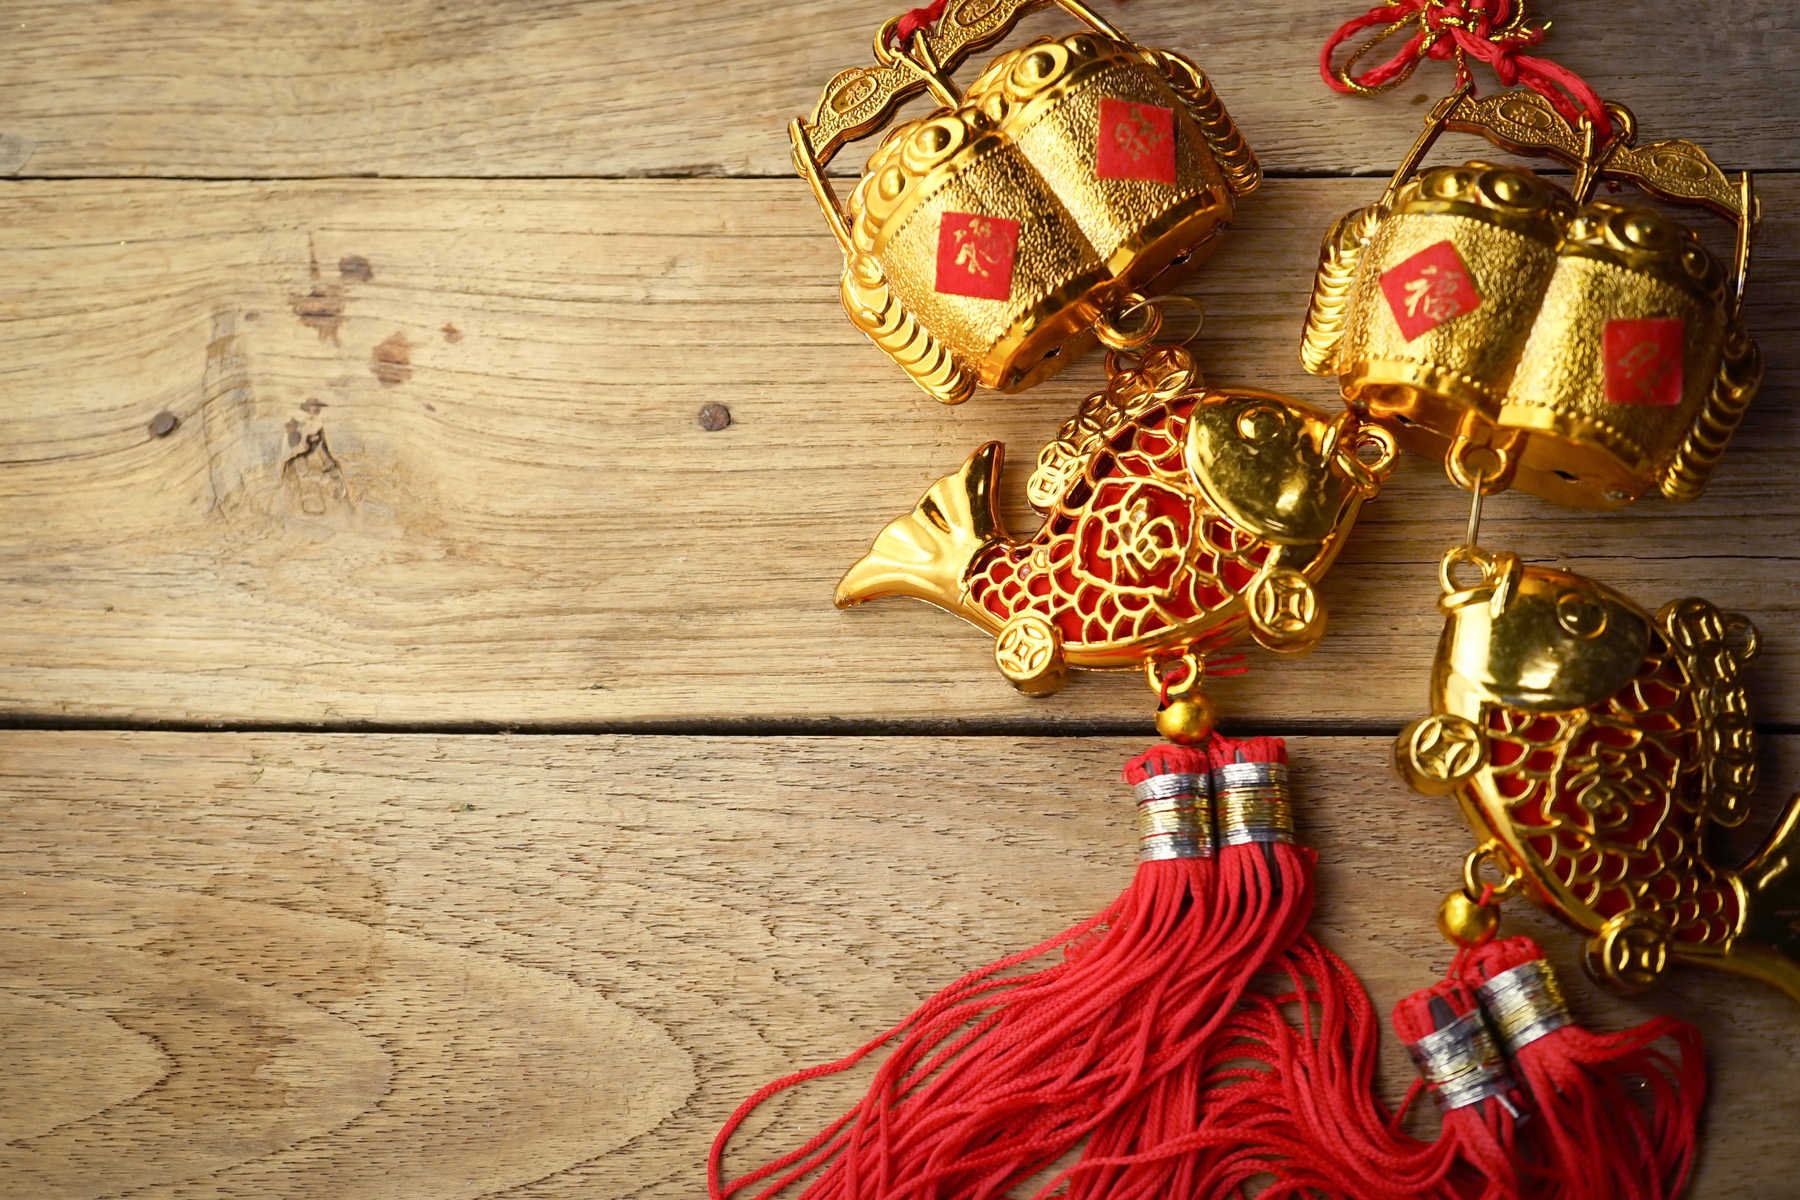 Chinese New Year fish decorations